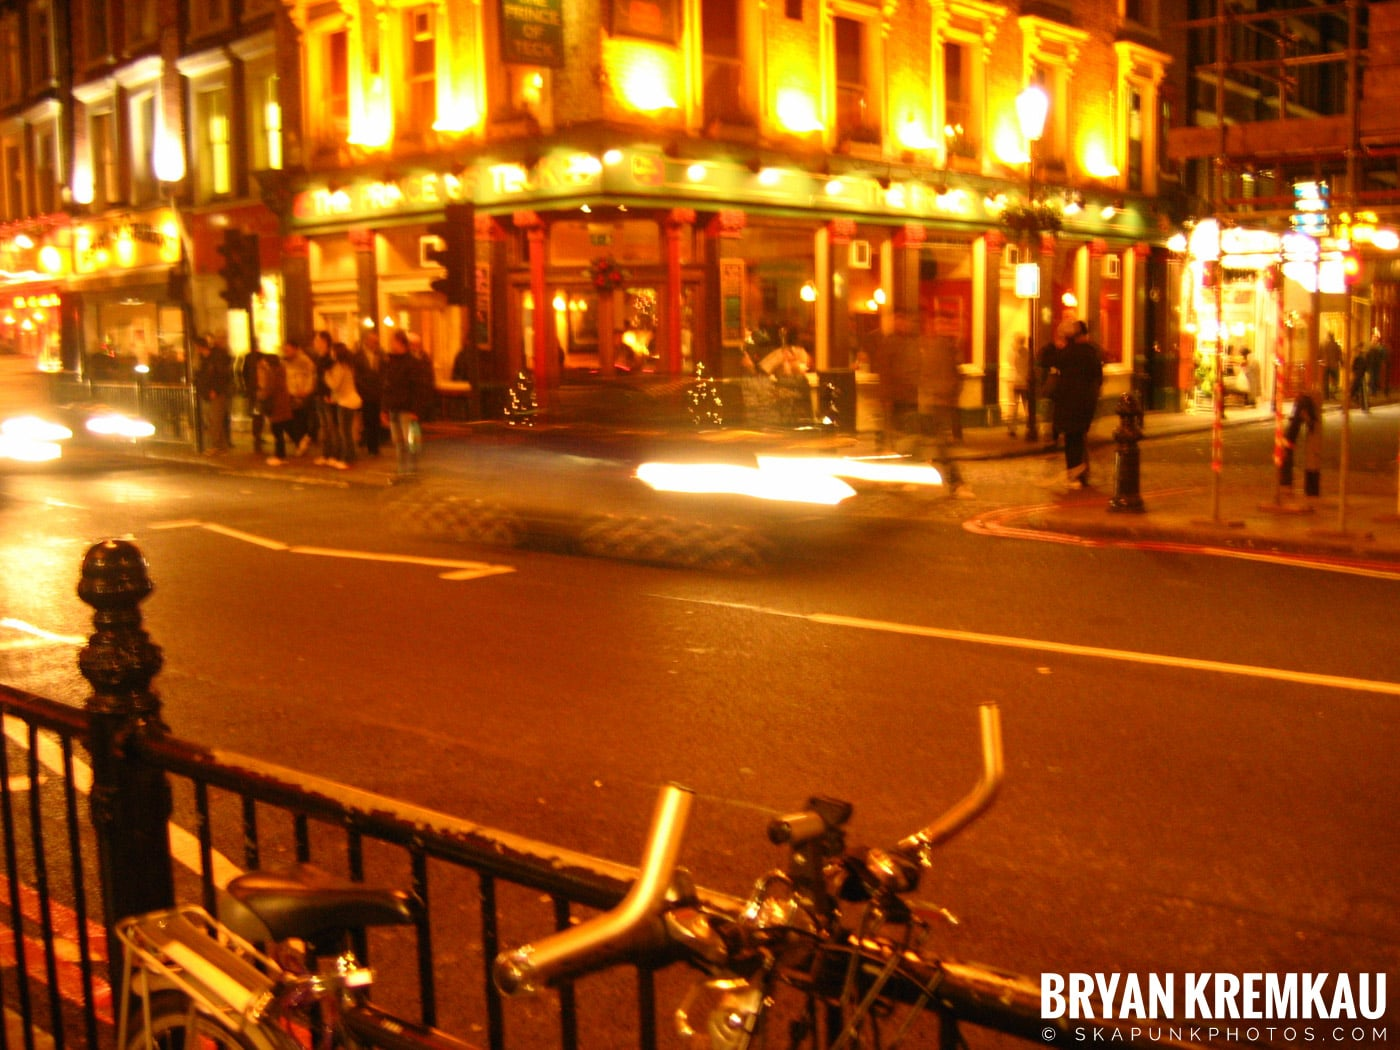 London, England - Day 1 - 12.16.05 (10)